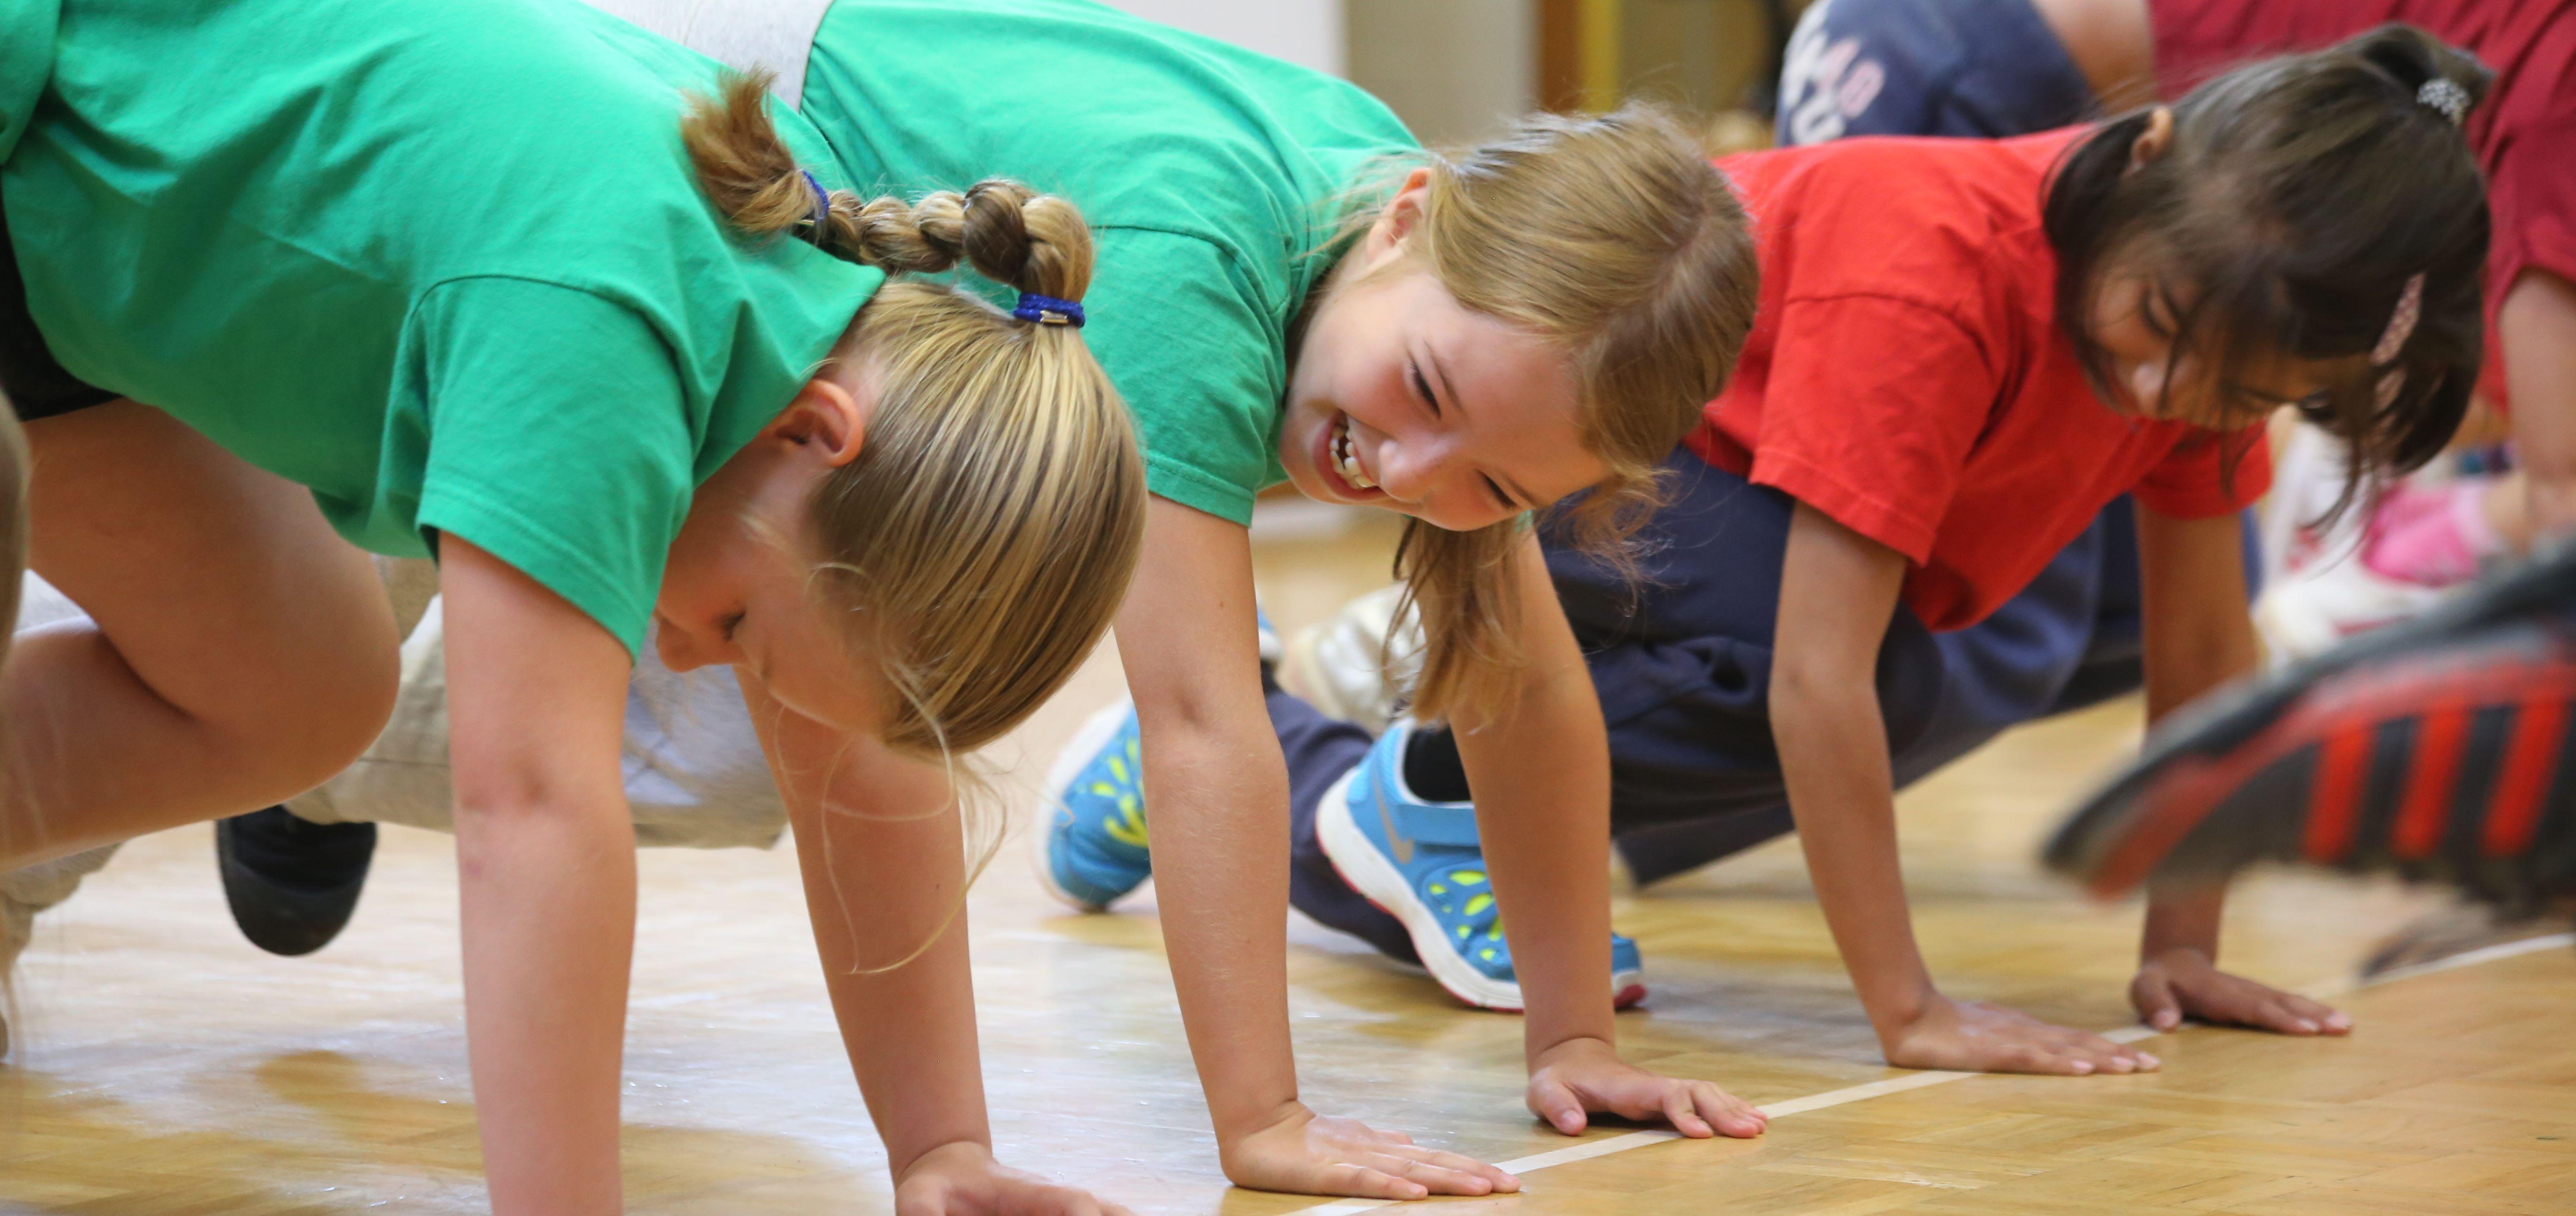 Kids doing push-ups